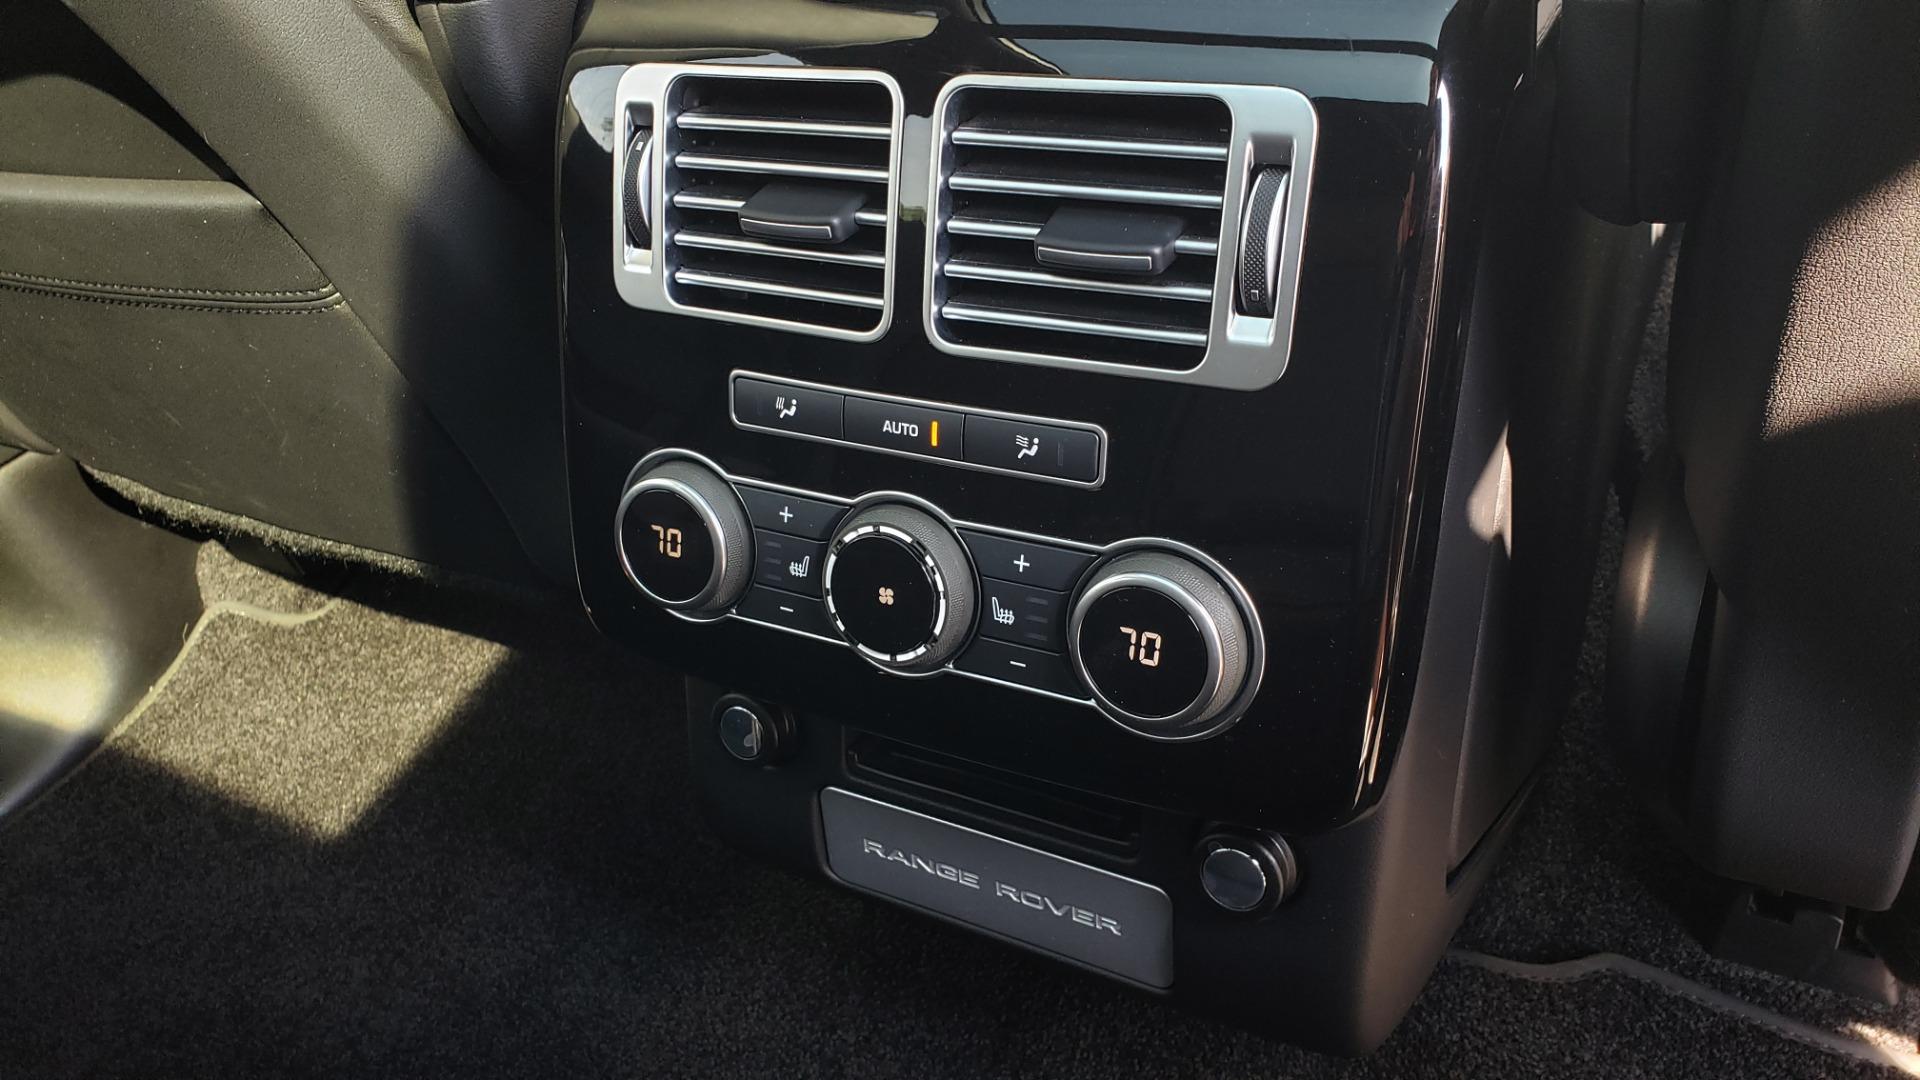 Used 2017 Land Rover RANGE ROVER SC V8 / VISION ASST / DRIVE PKG / MERIDIAN SOUND / PANO-ROOF / NAV / BSM for sale $75,995 at Formula Imports in Charlotte NC 28227 83